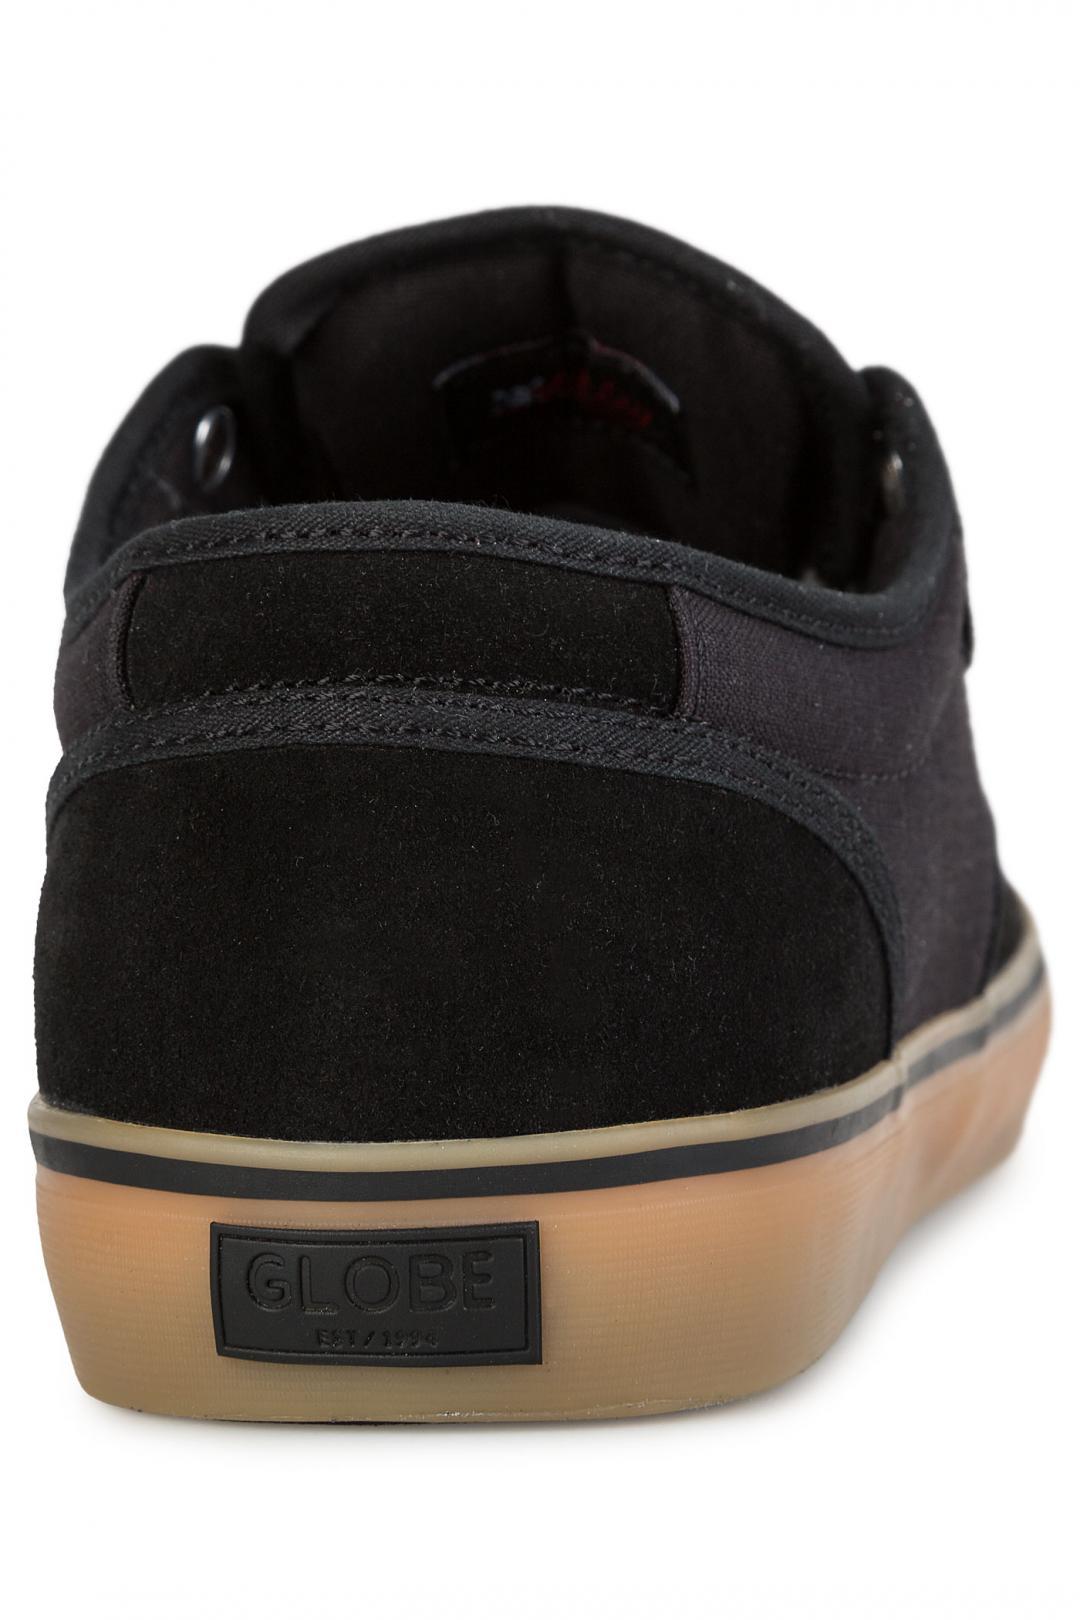 Uomo Globe Motley black black gum | Sneakers low top